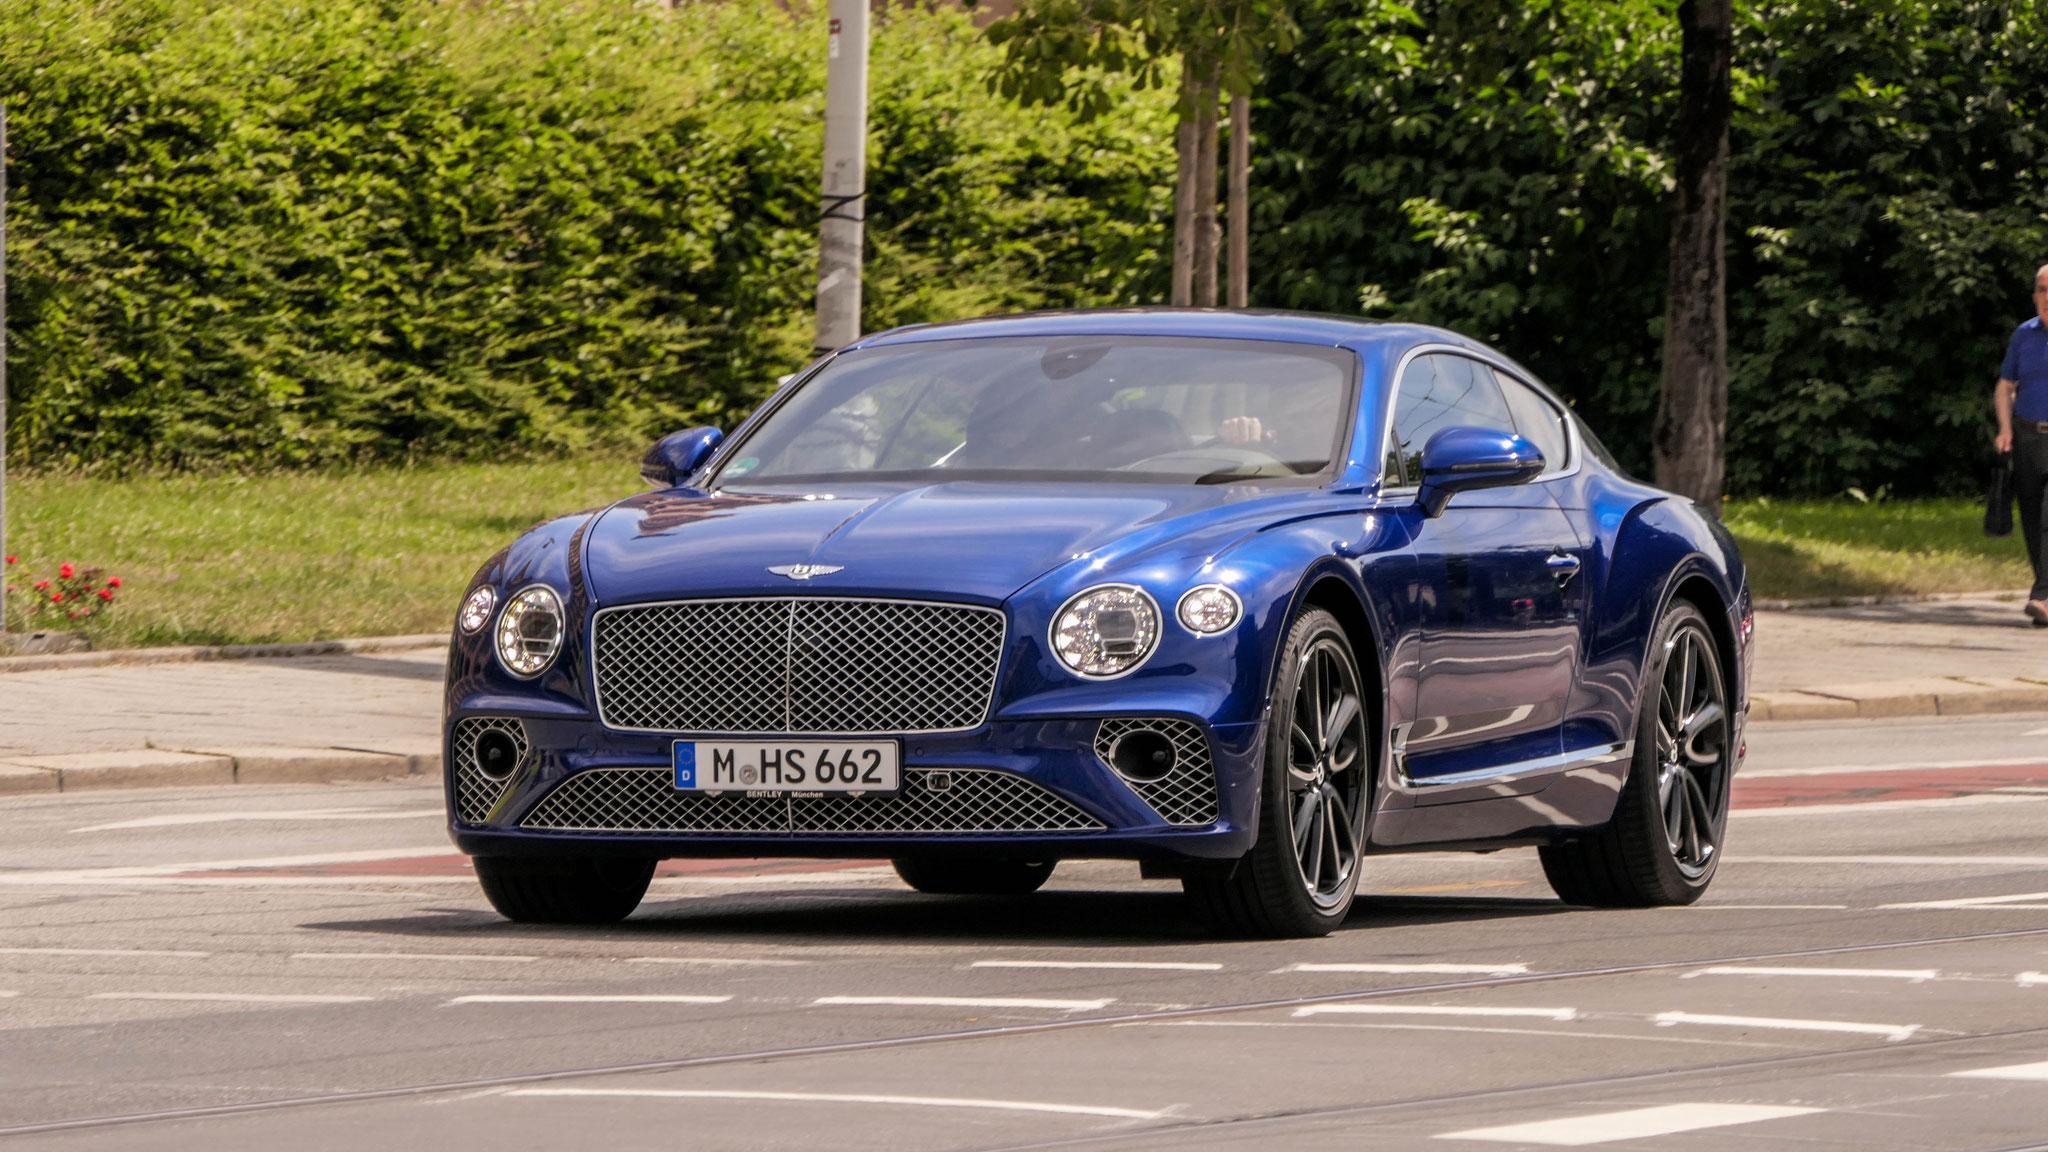 Bentley Continental GT - M-HS-662